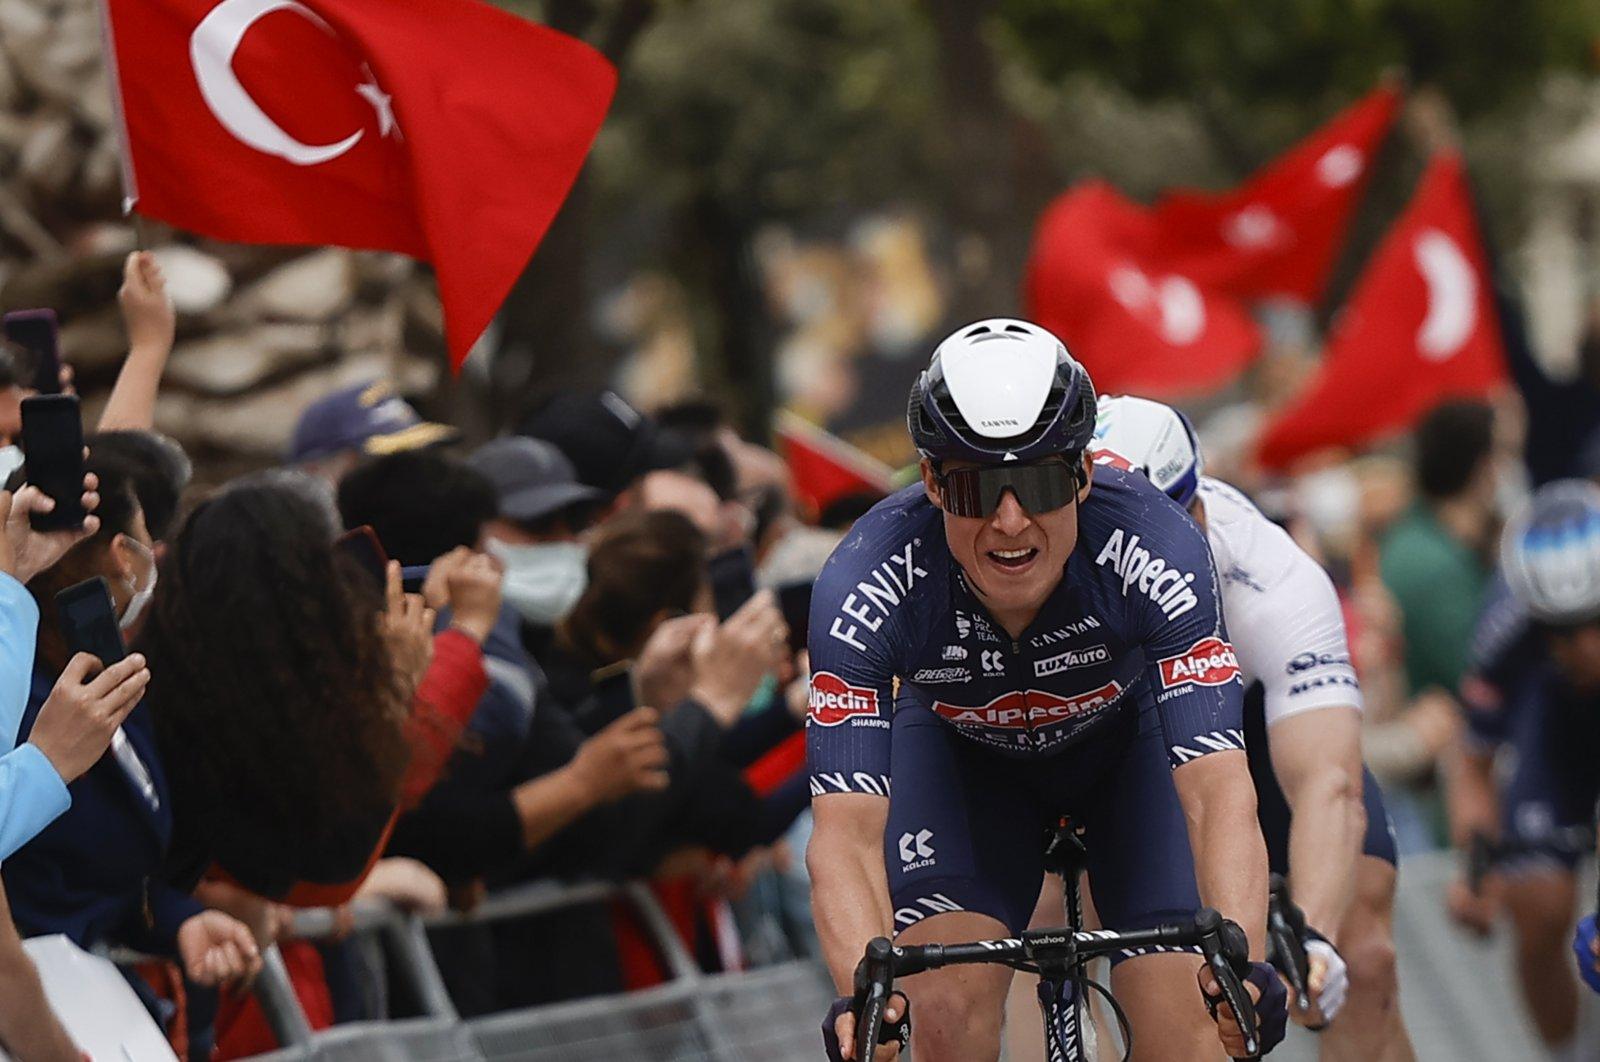 Belgium's Jasper Philipsen approaches the finish line of the 180-kilometer (111.8-mile) seventh stage between Marmaris and Turgutreis on the 56th Presidential Cycling Tour of Turkey, Turgutreis, southern Turkey, April 16, 2021. (AA Photo)